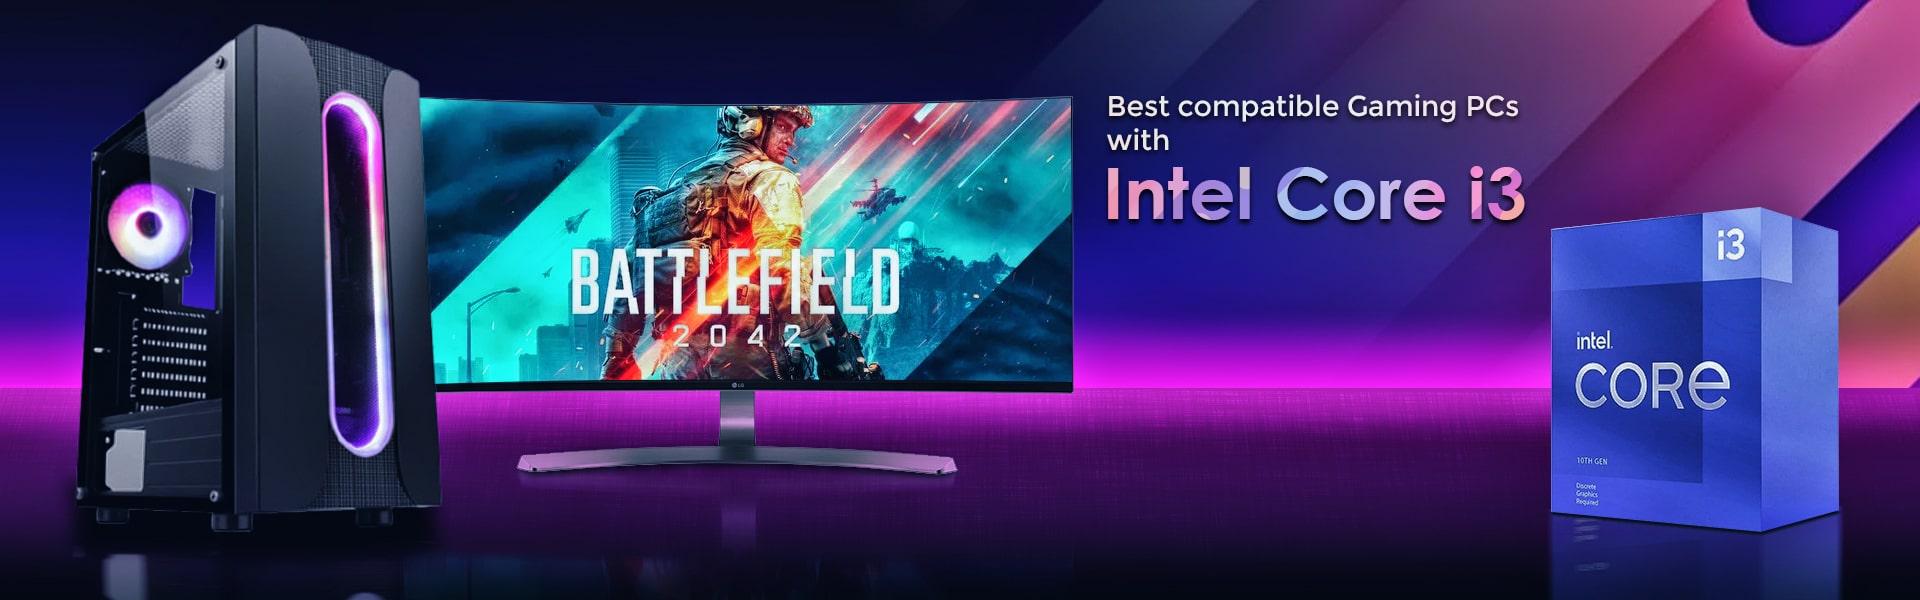 Intel i3 Gaming PCs